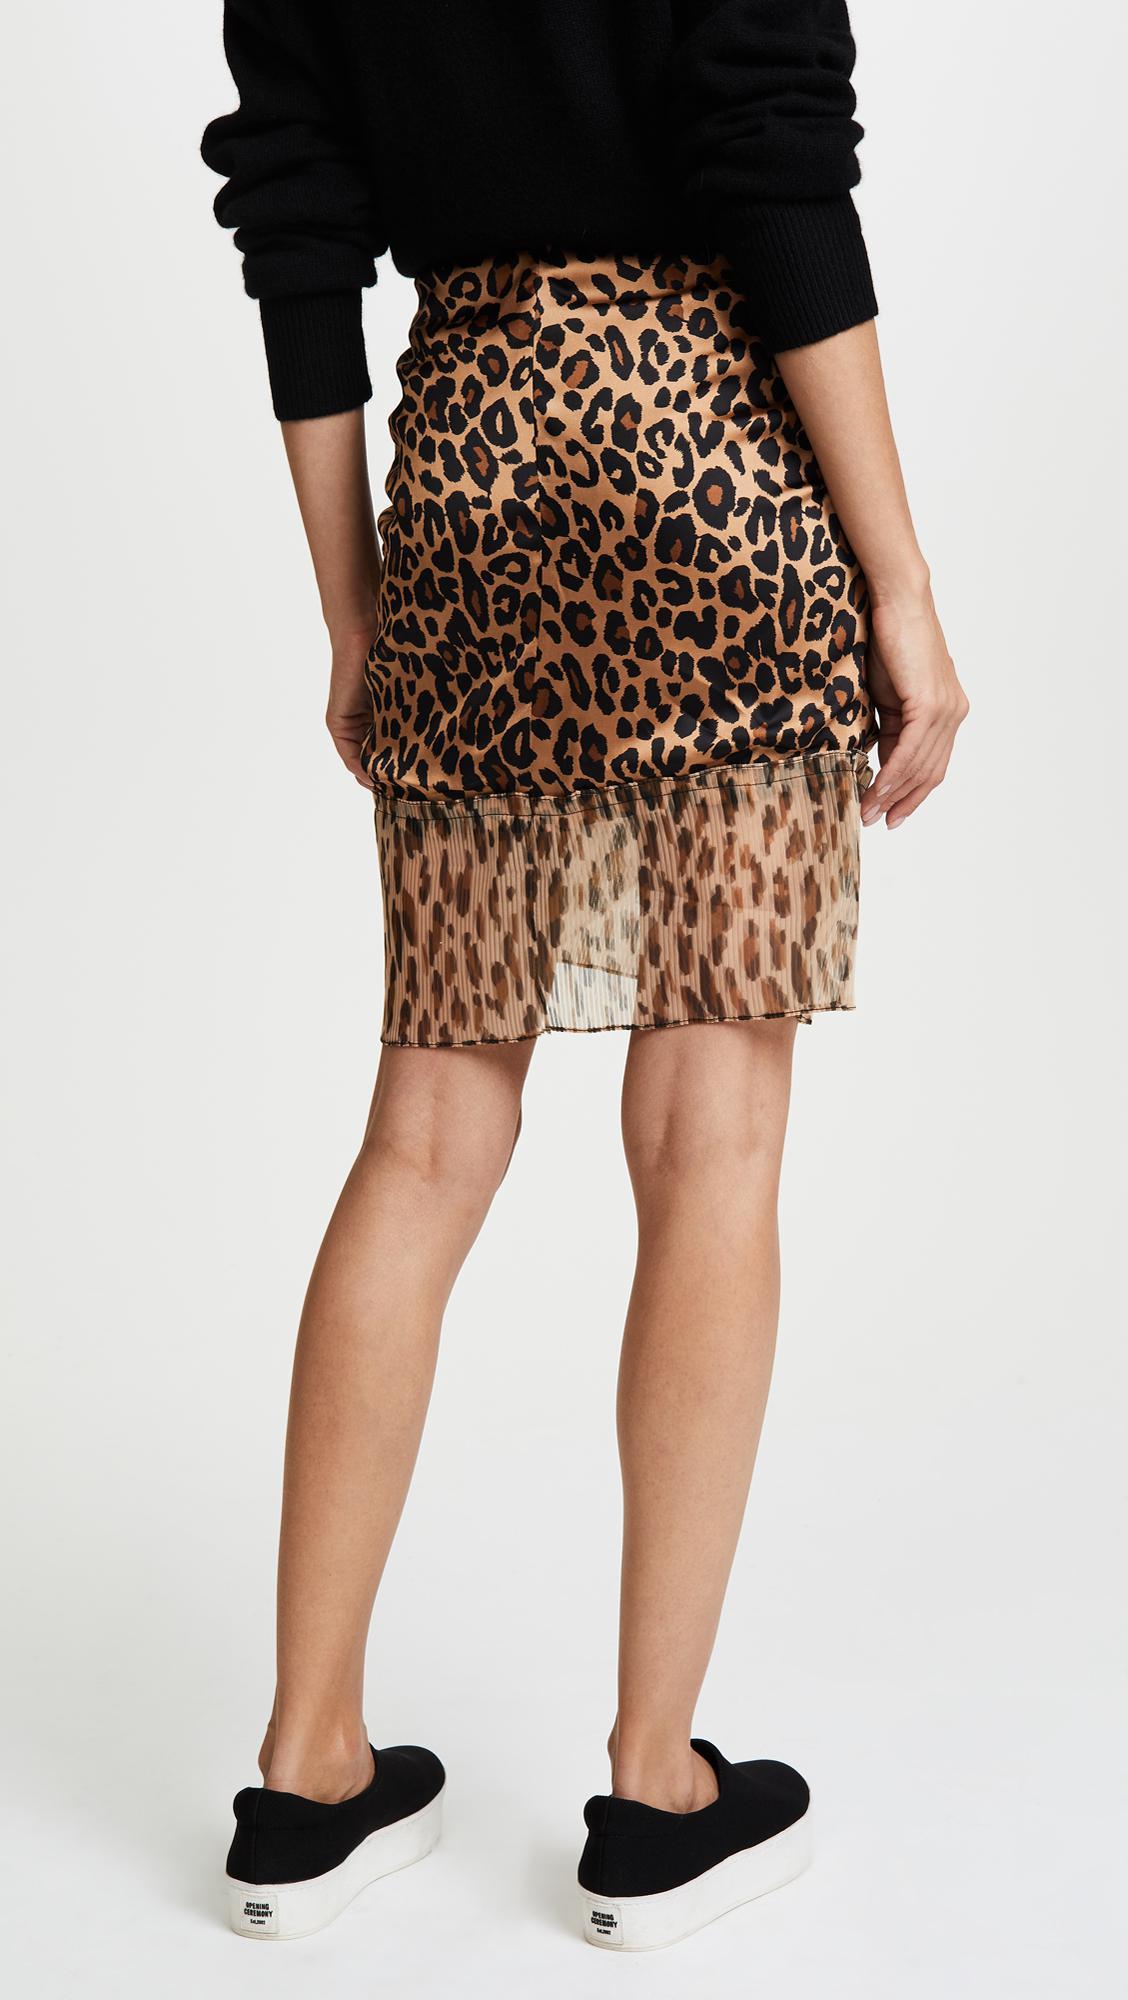 d3dea042e6 SJYP Leopard Pleats Detail Mini Skirt in Natural - Lyst